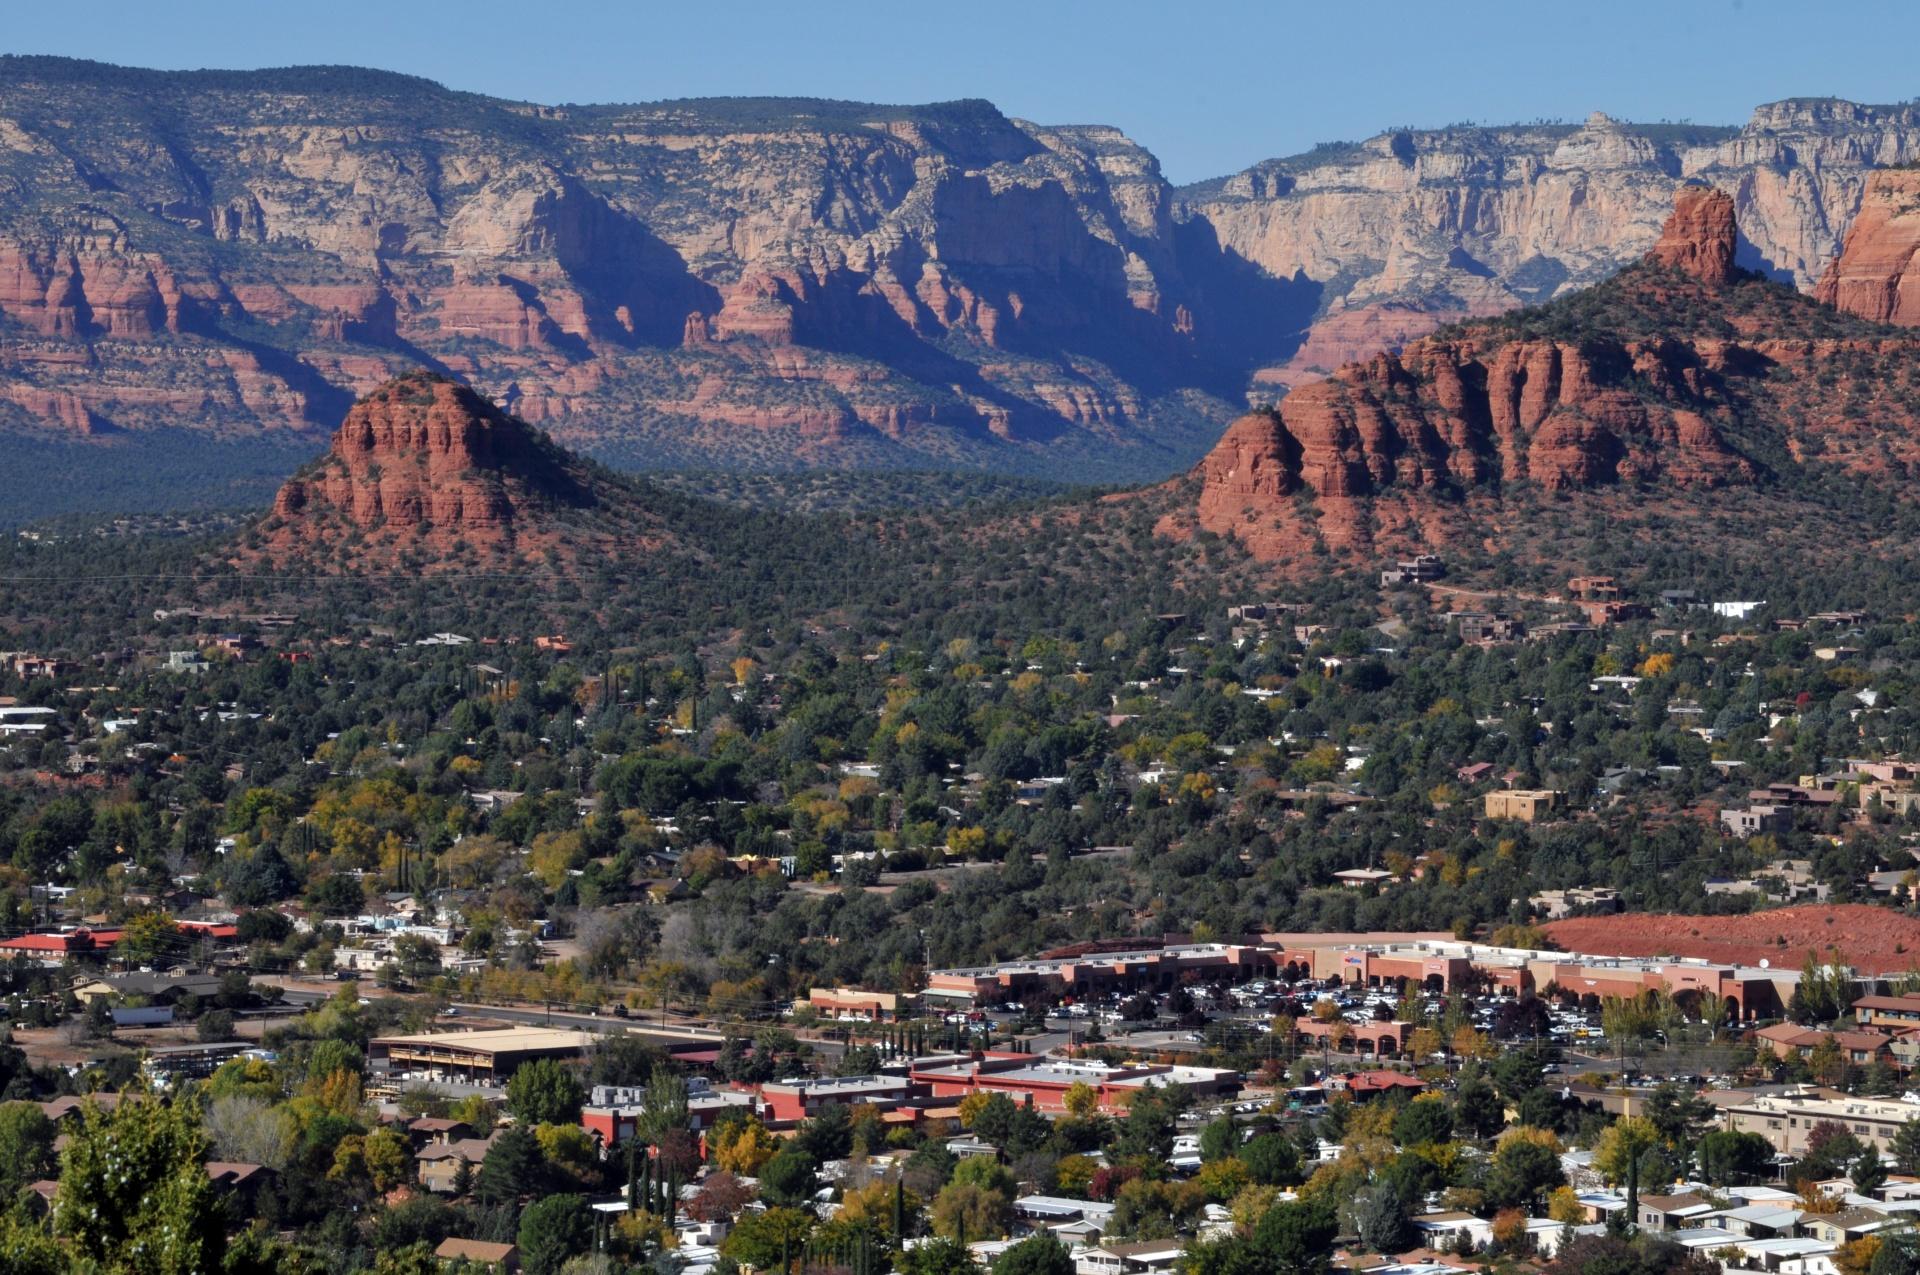 Nice Weekend Destination From Tucson-Sedona